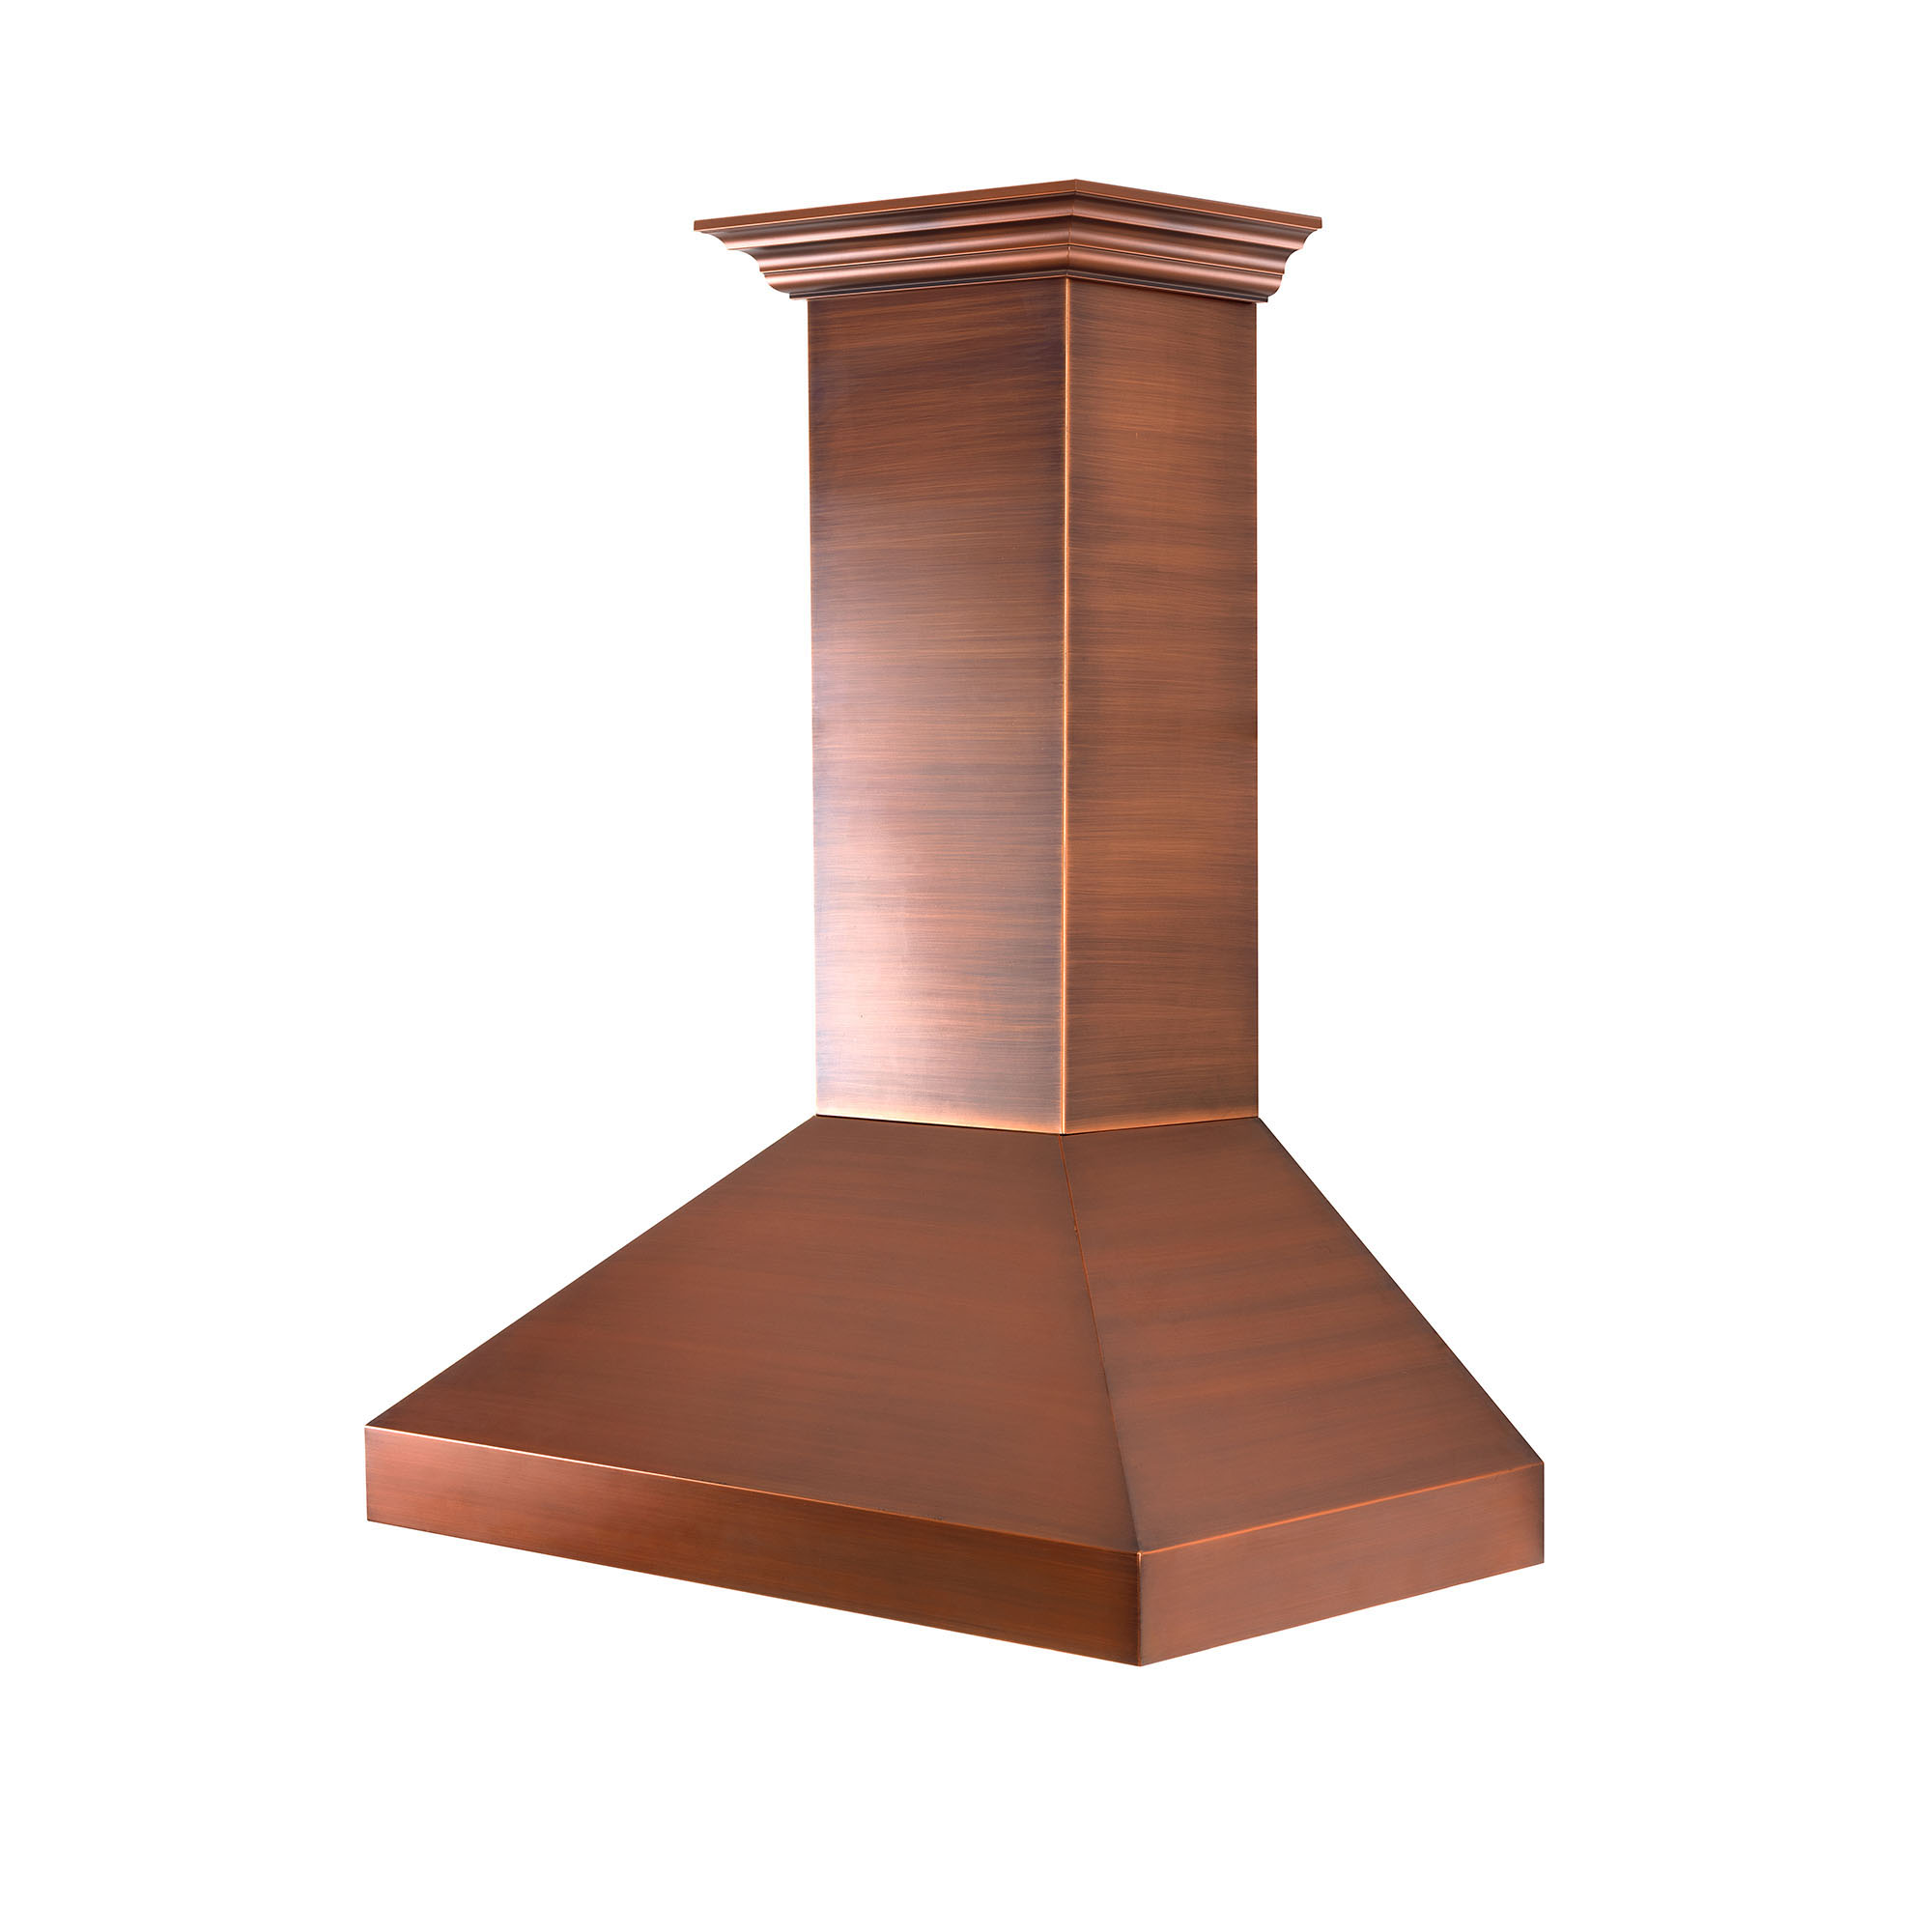 zline-copper-wall-mounted-range-hood-8667C-main-.jpg